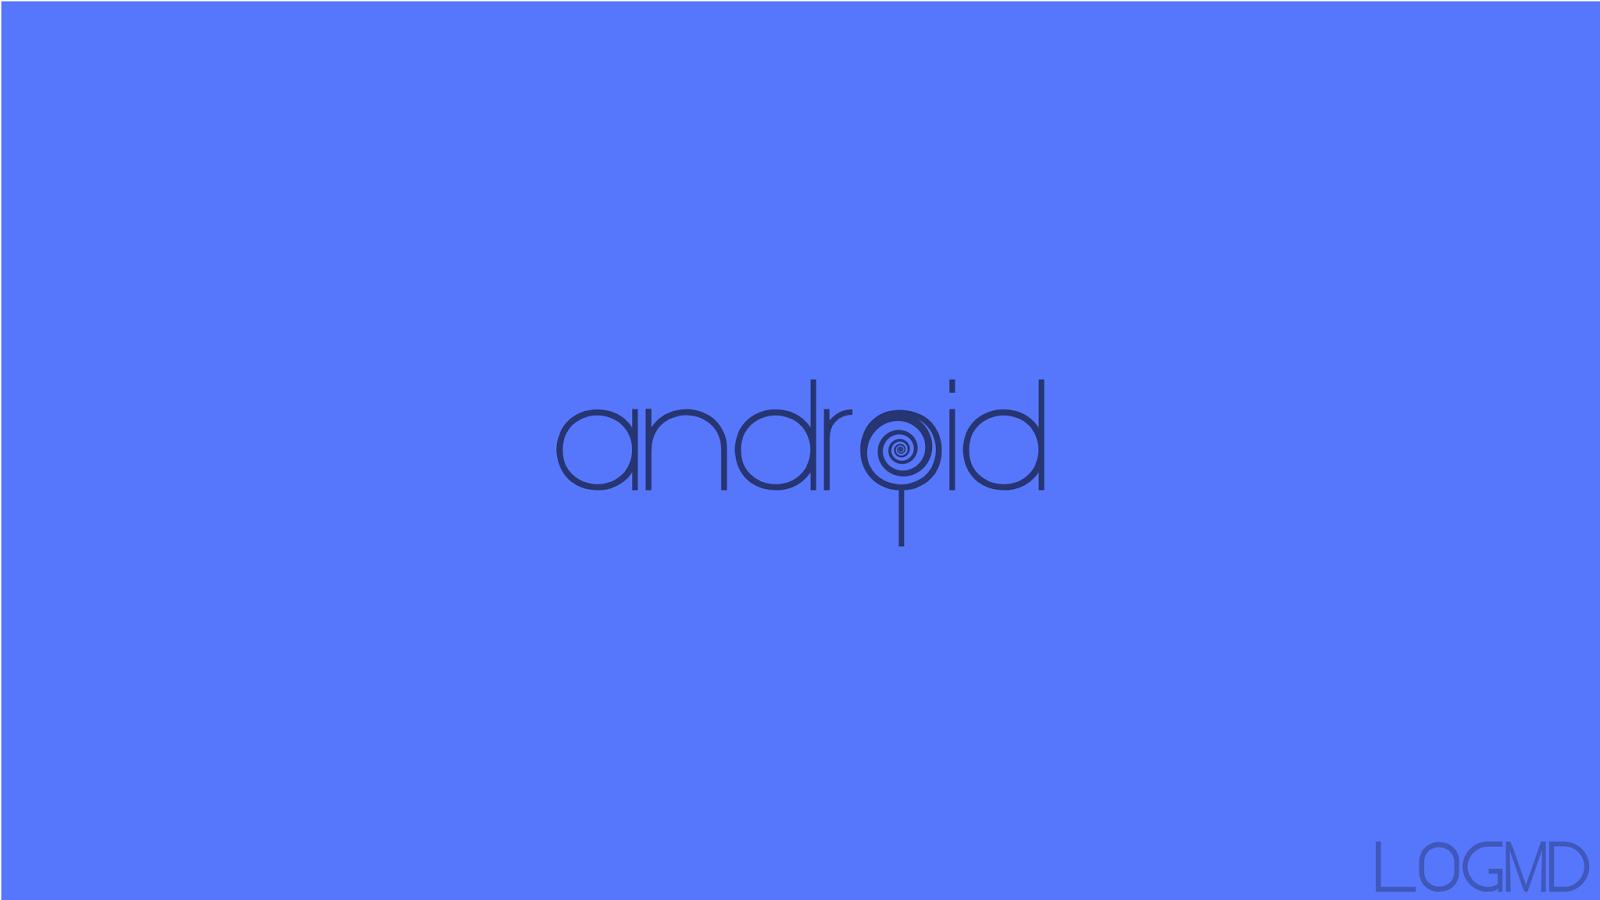 LOGMD Android 5.0 Lollipop Material Design Wallpaper Set! ~ LOGMD